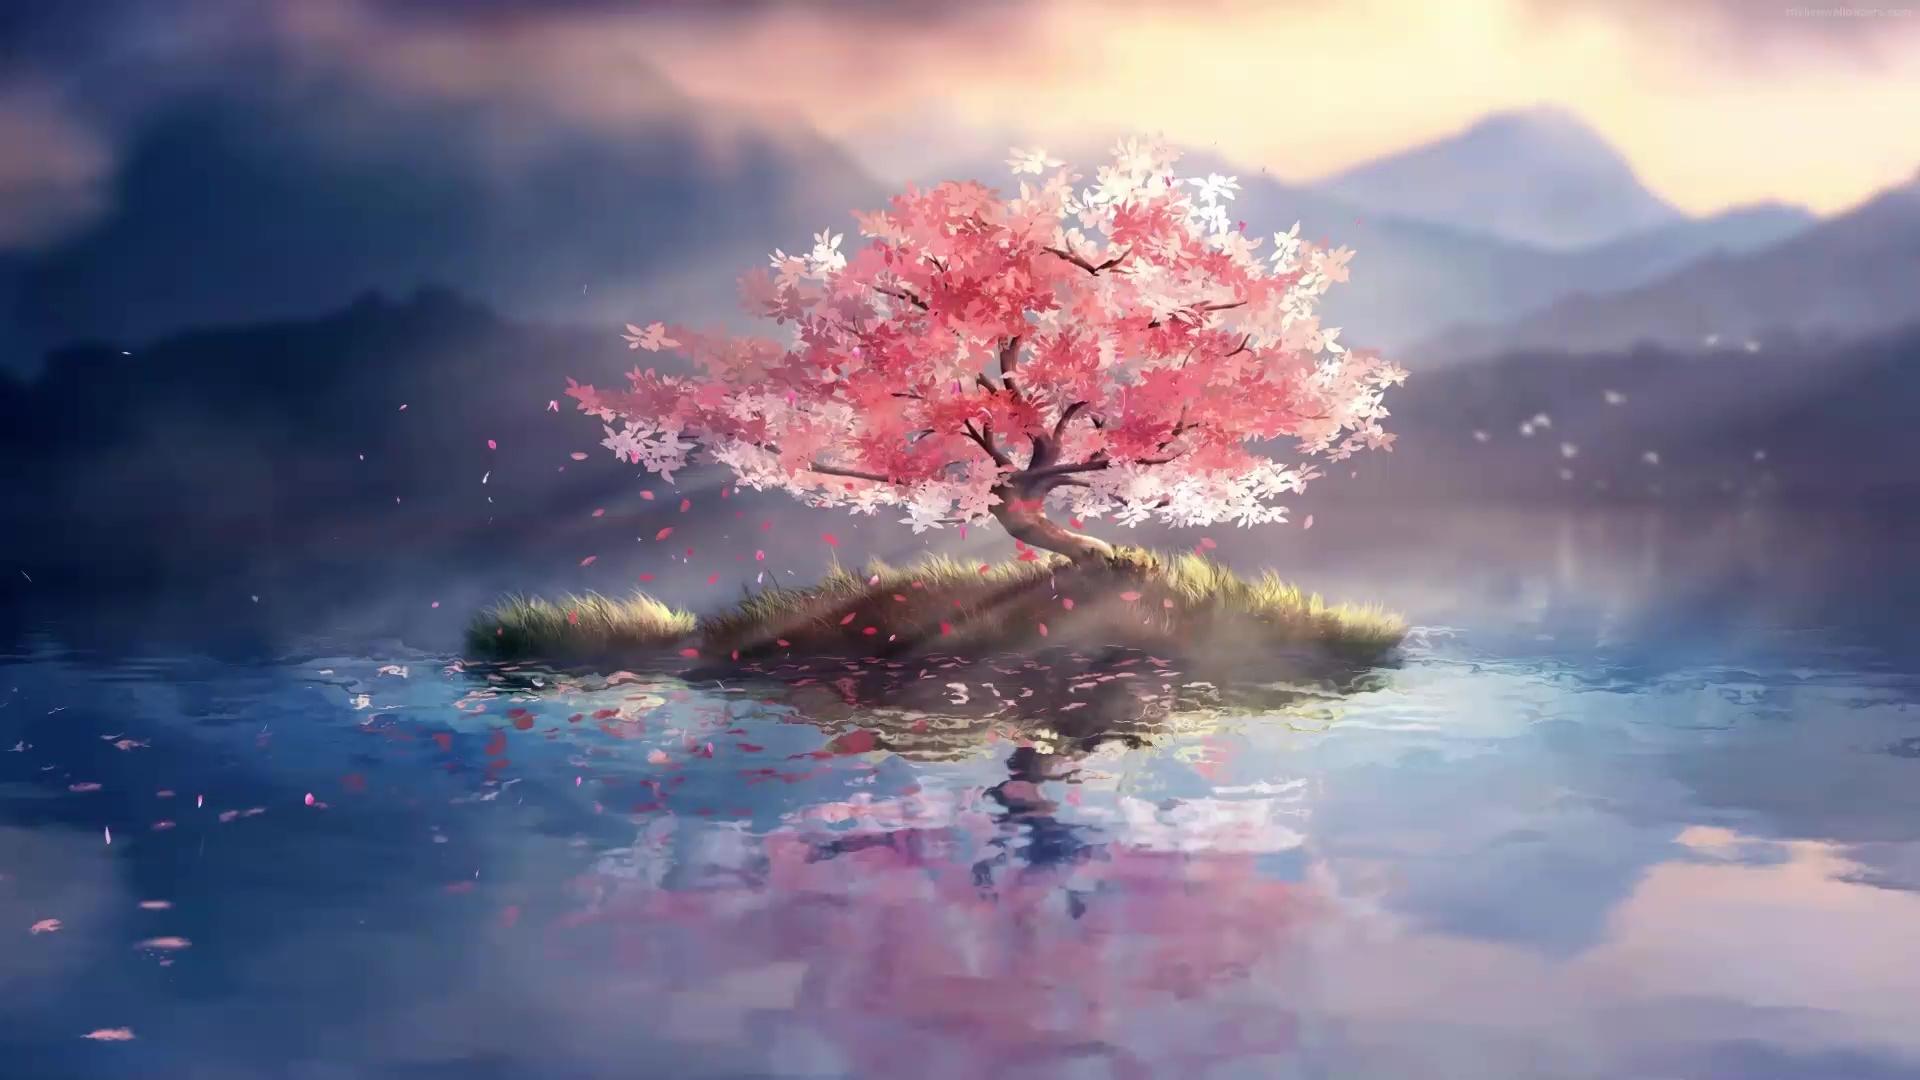 Lone Cherry Blossom Tree Live Wallpaper - WallpaperWaifu